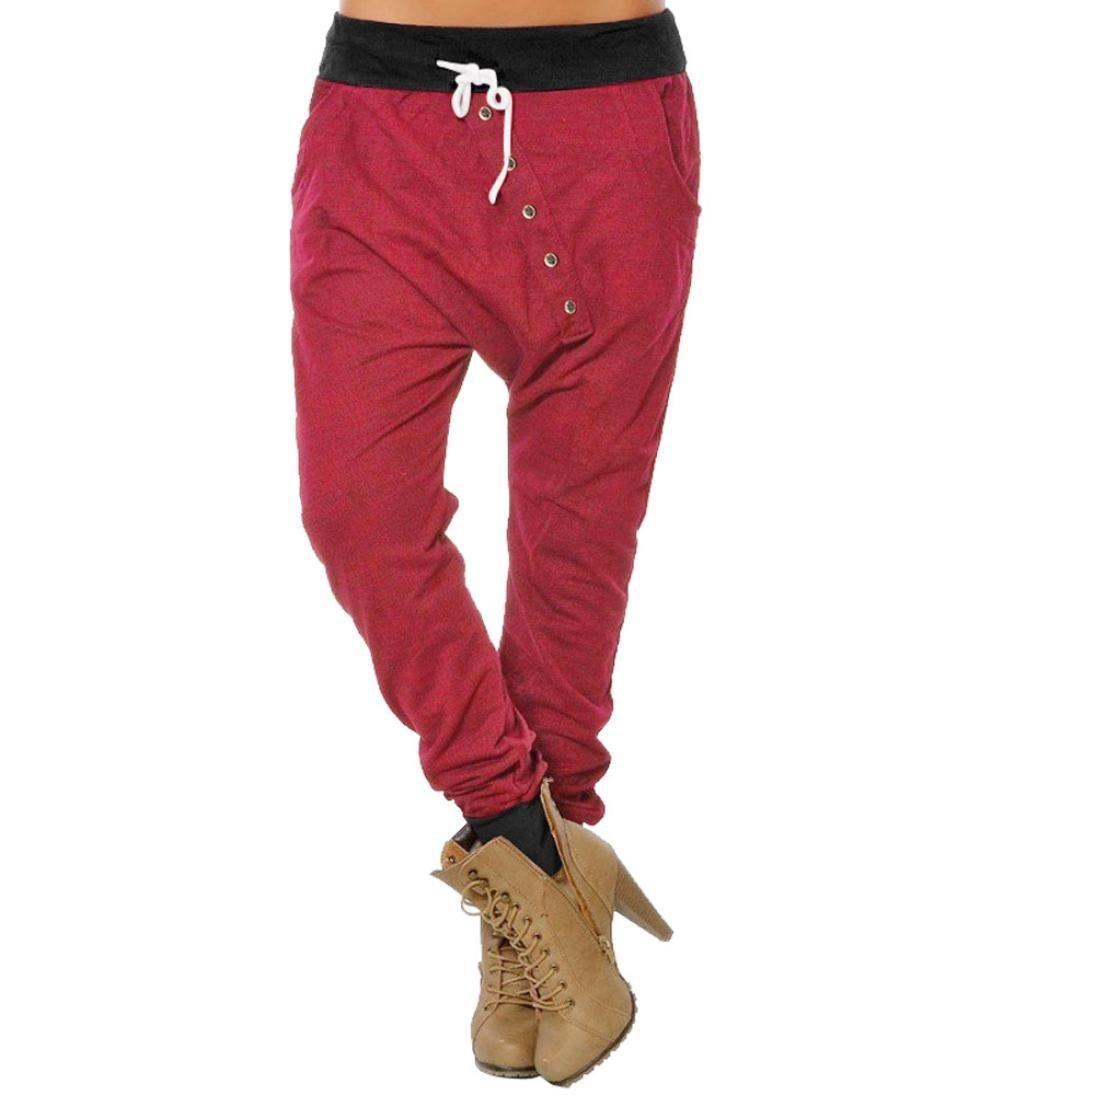 Alixyz Women's Drop Crotch Hip Hop Jogger Harem Pants Fashion Baggy Pants Trousers